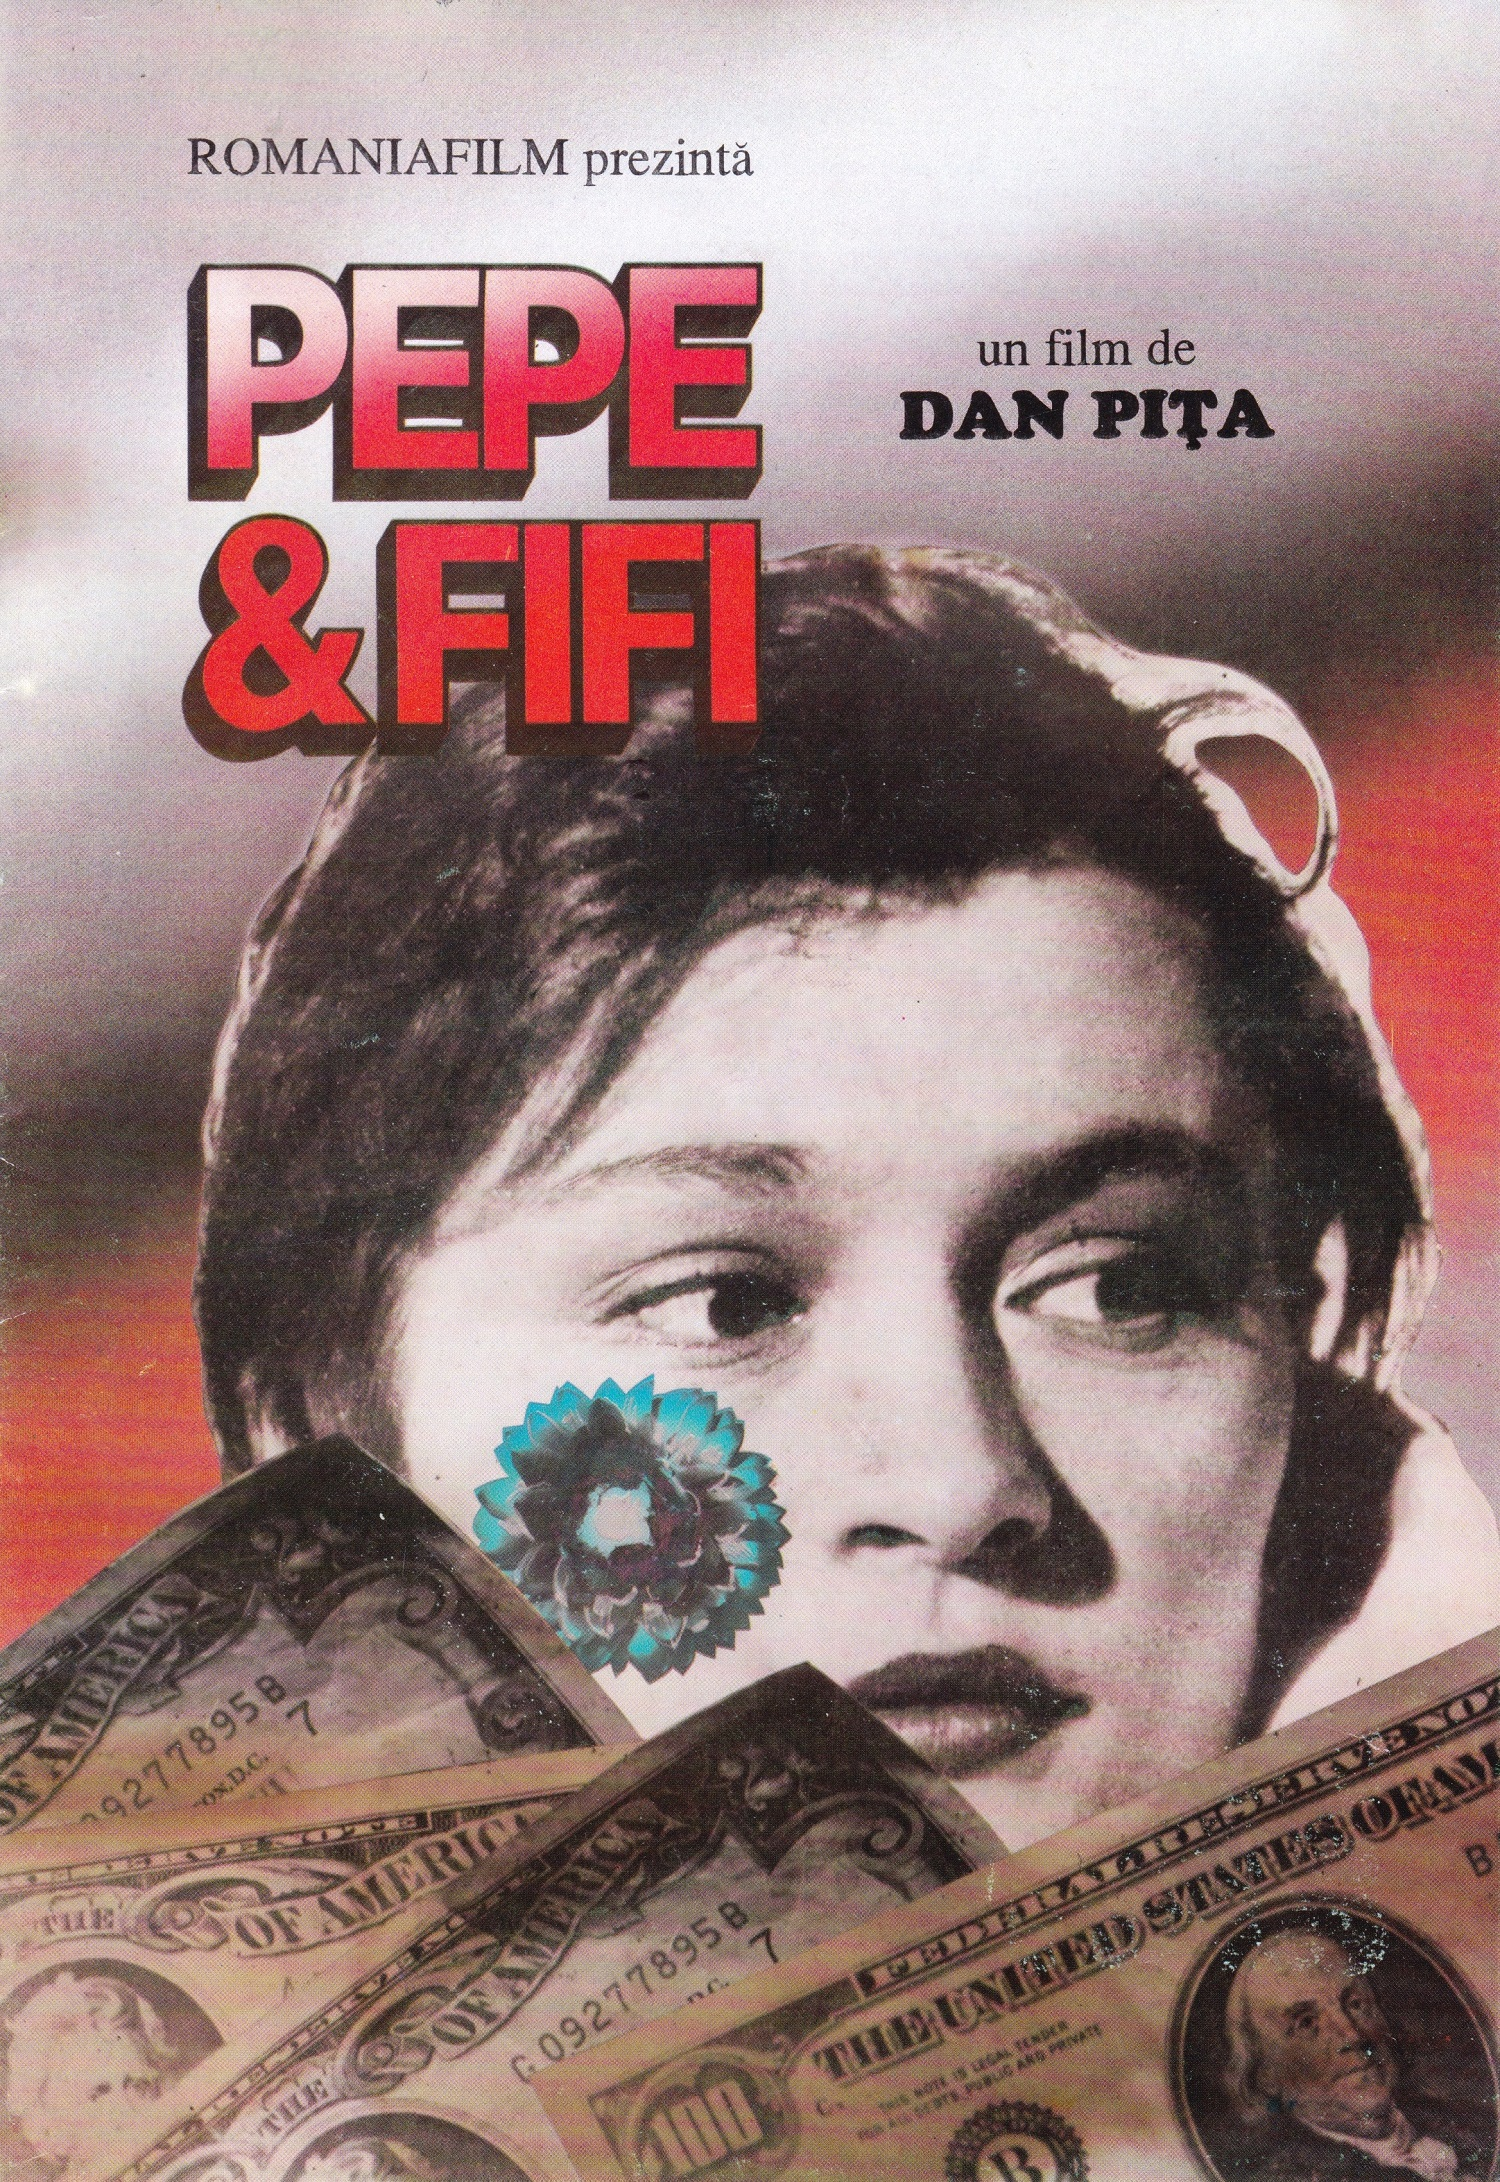 Pepe & Fifi (1993) - Photo